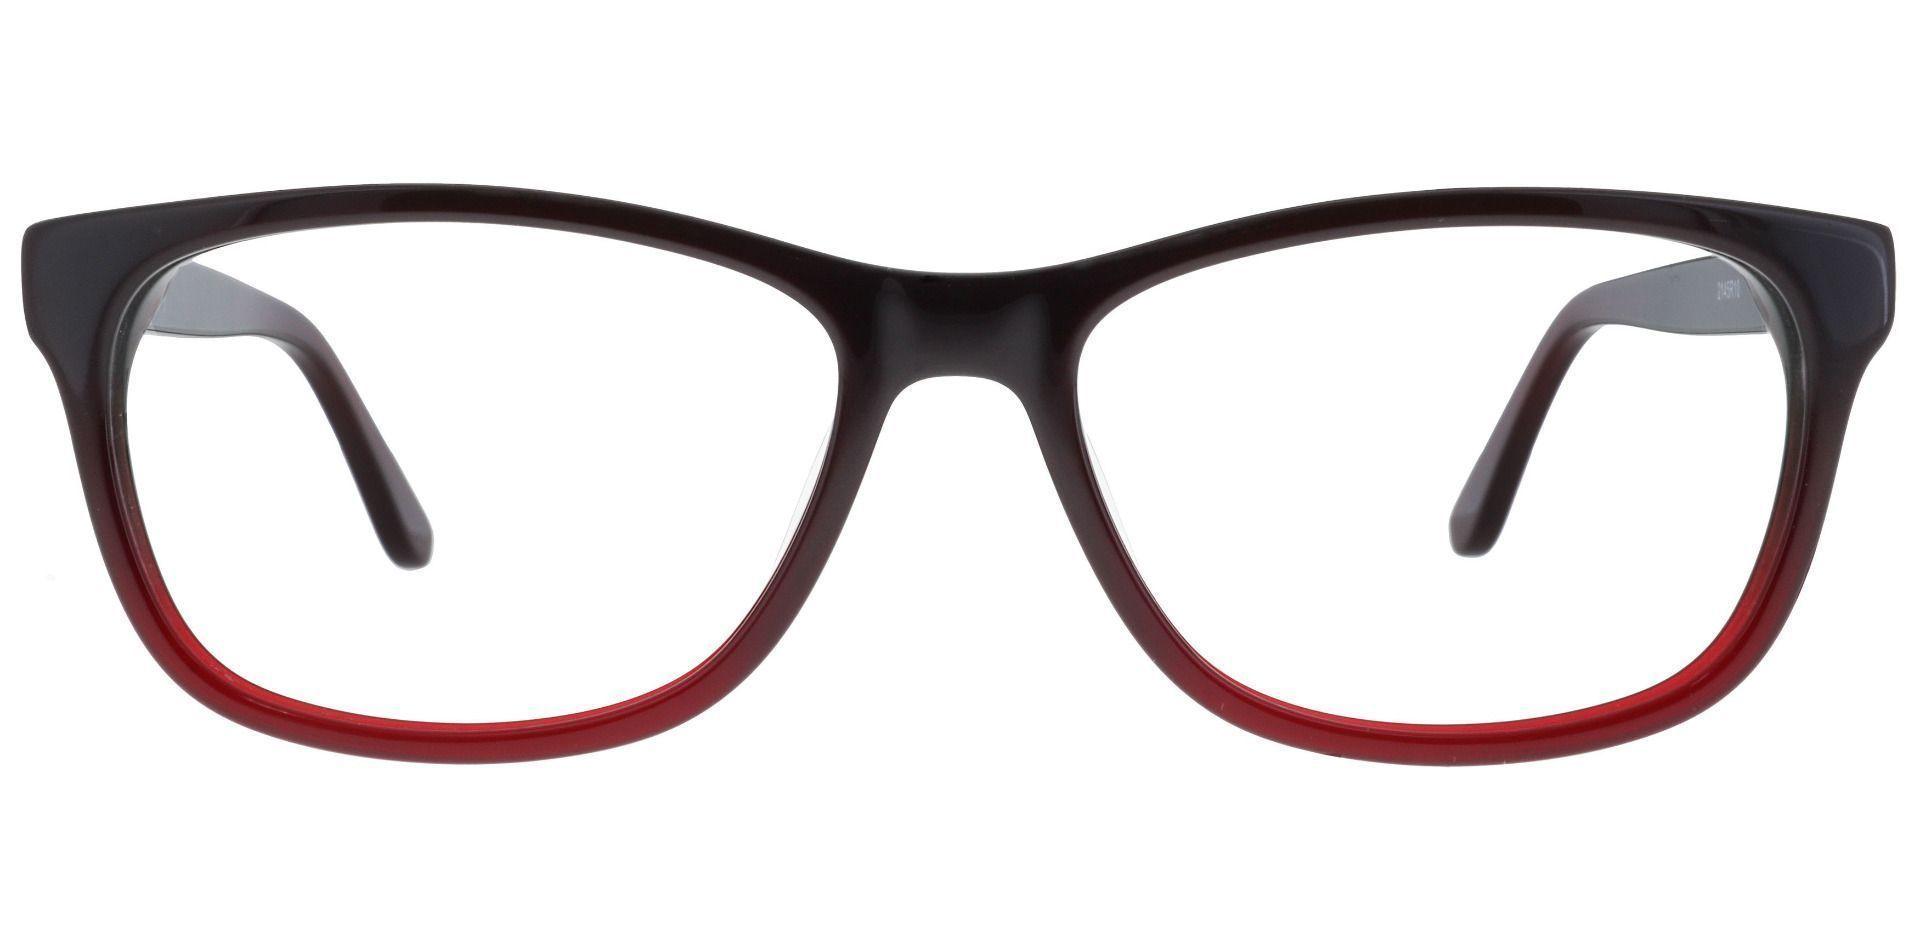 Azure Rectangle Prescription Glasses - Red